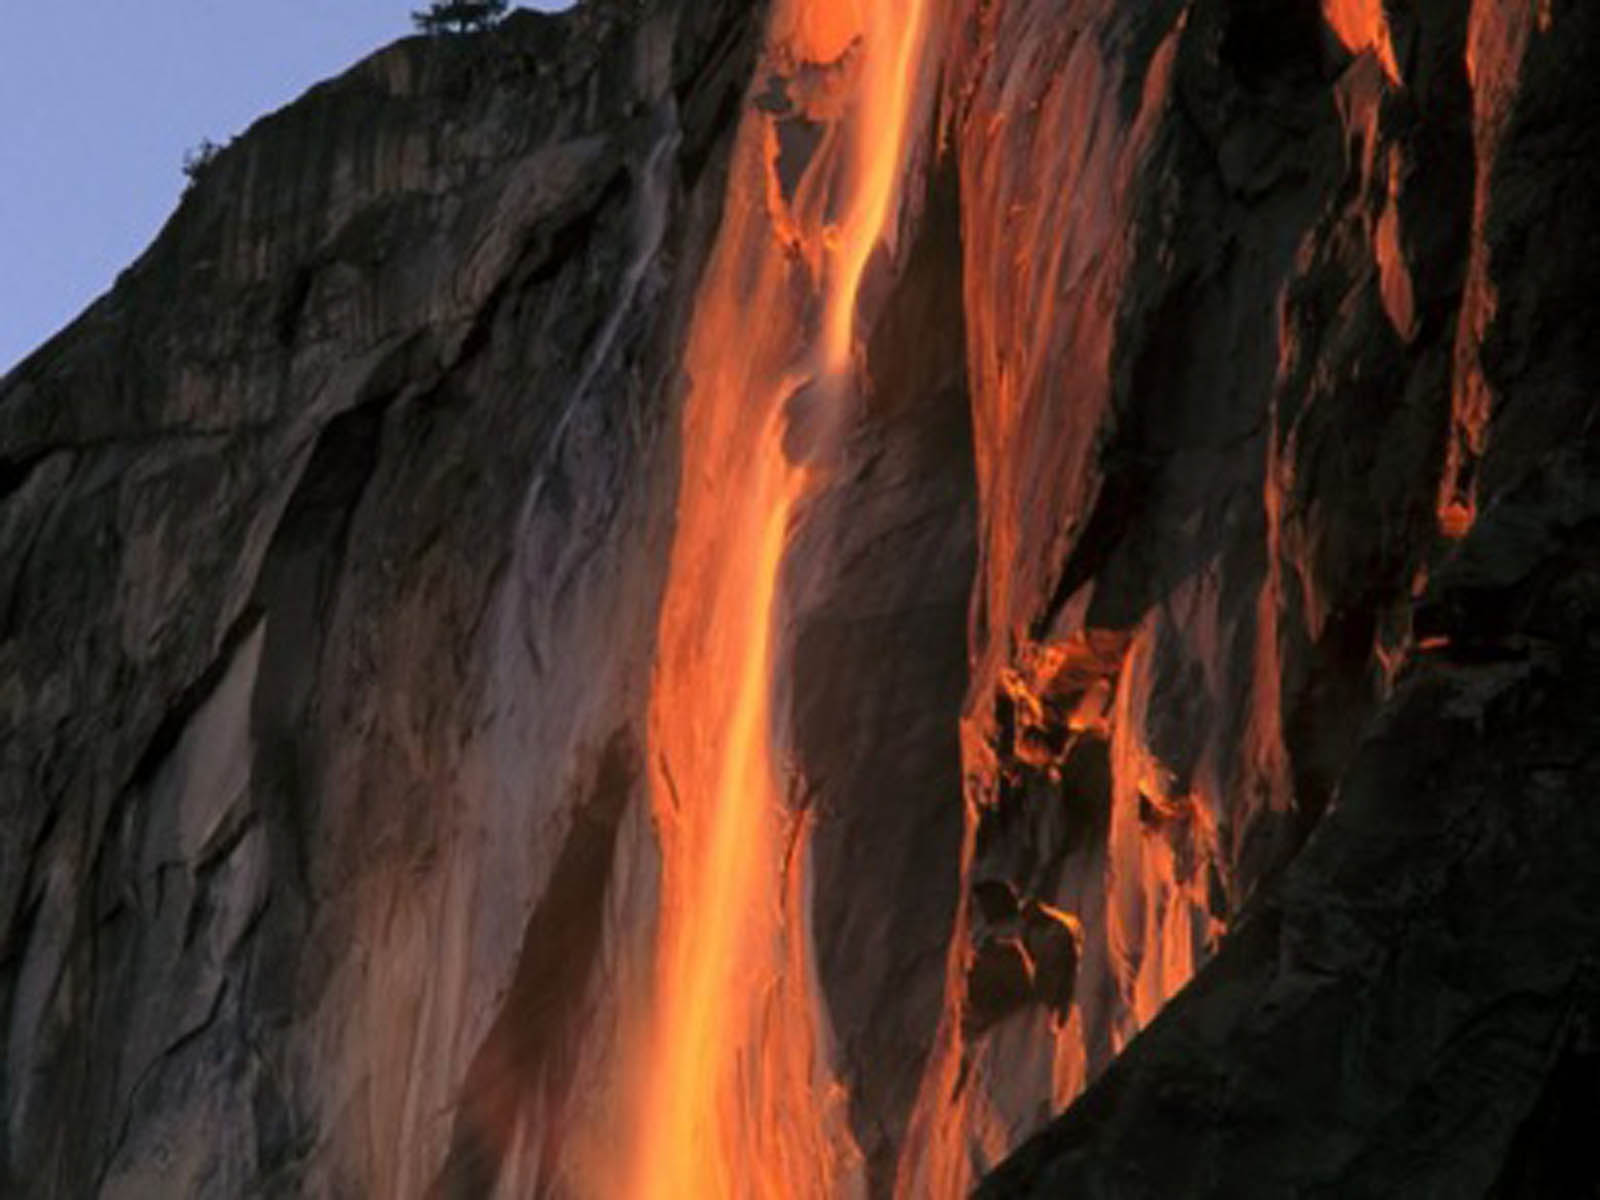 Yosemite Lava Falls Wallpaper Horsetail Falls Yosemite National Park California 2013